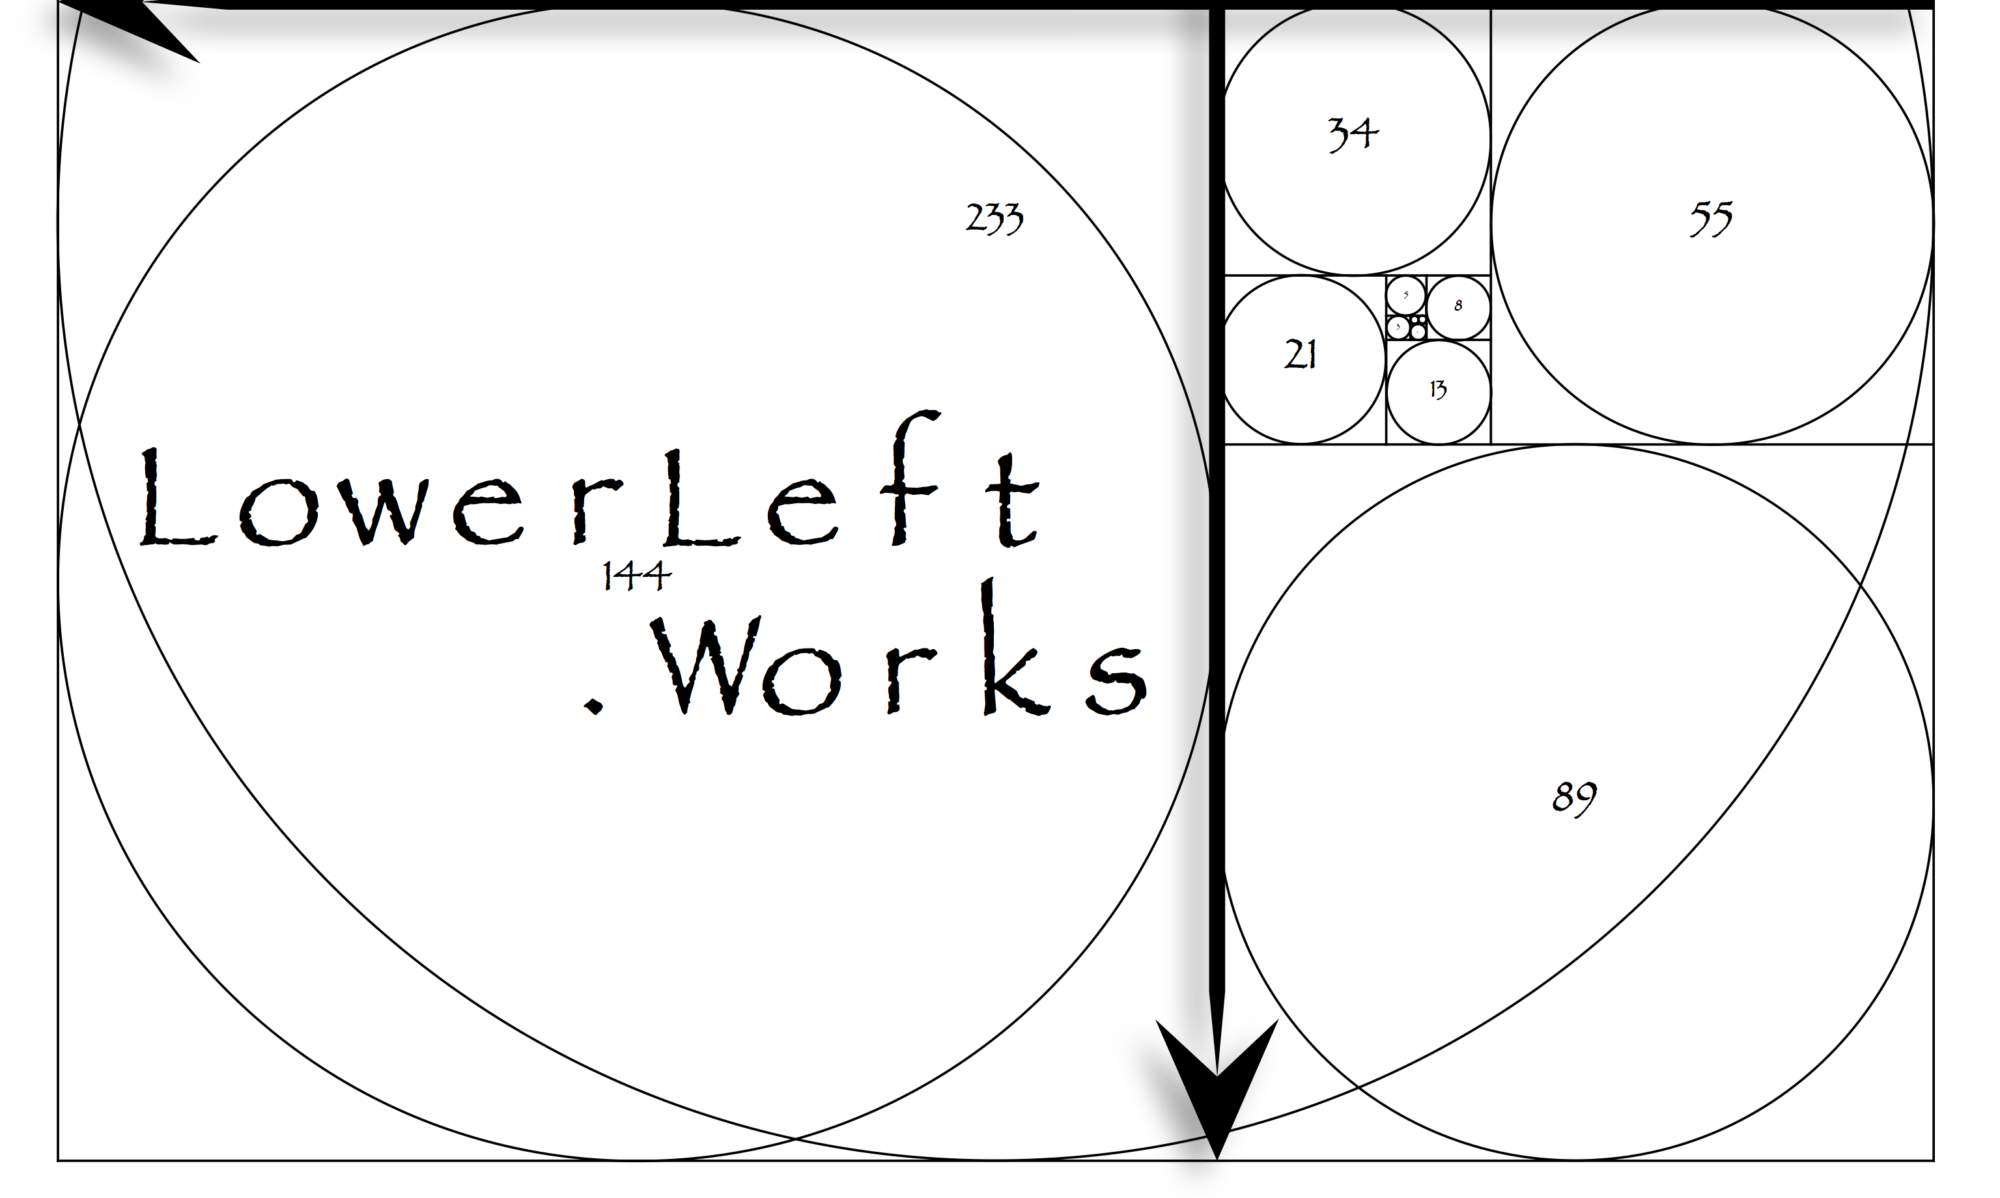 LowerLeft.Works